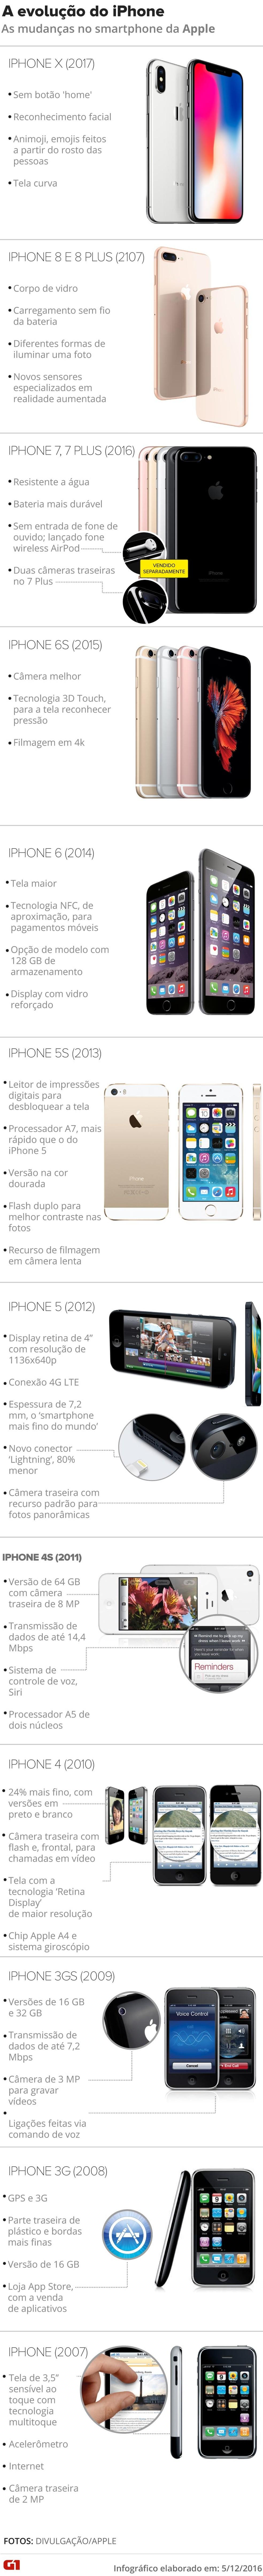 Histrico do iPhone  Foto ArteG1